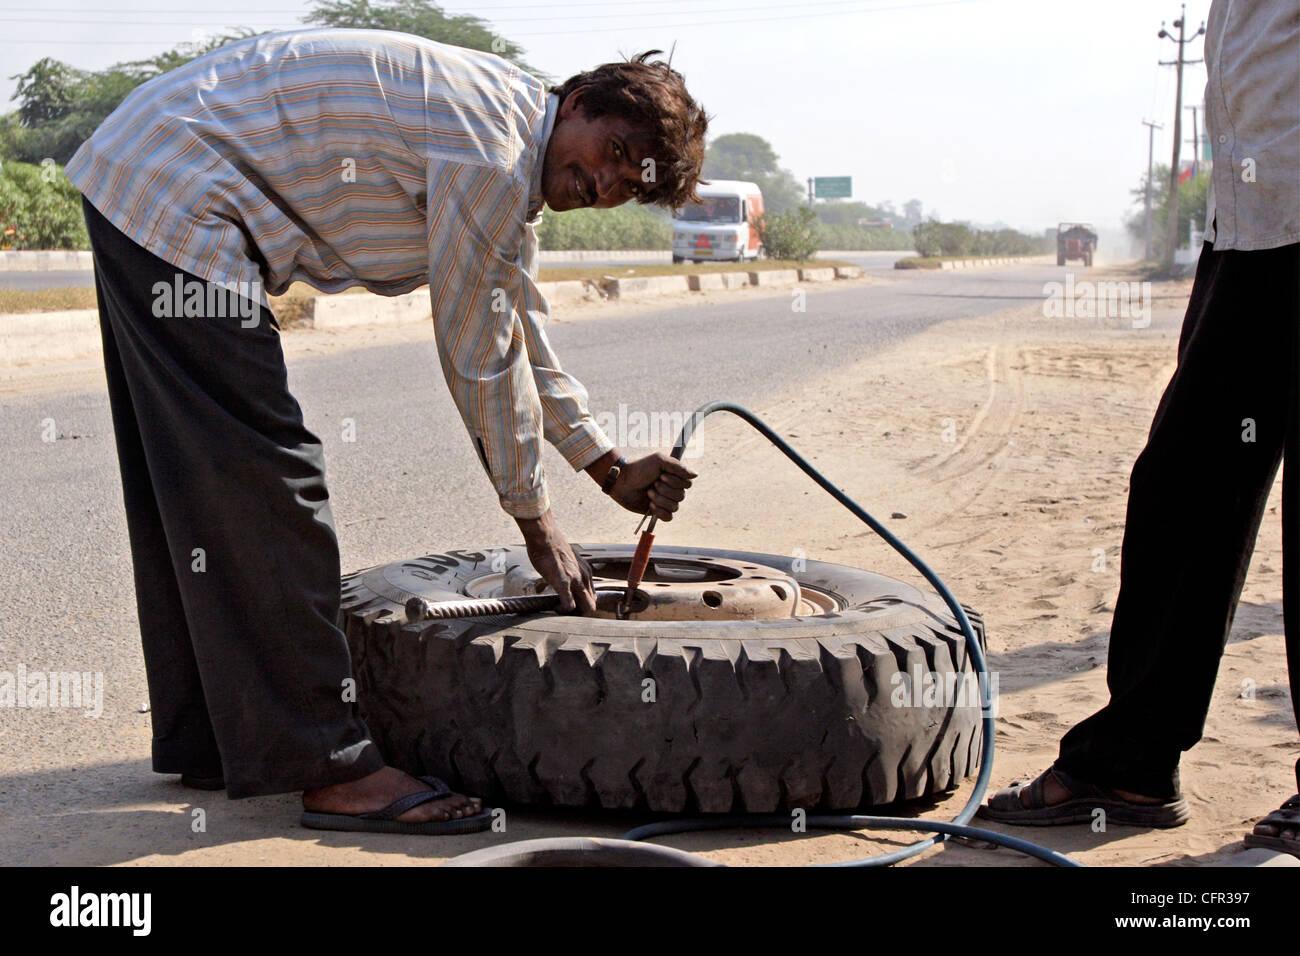 Percance en la carretera. Rajasthan. India. Stock Photo